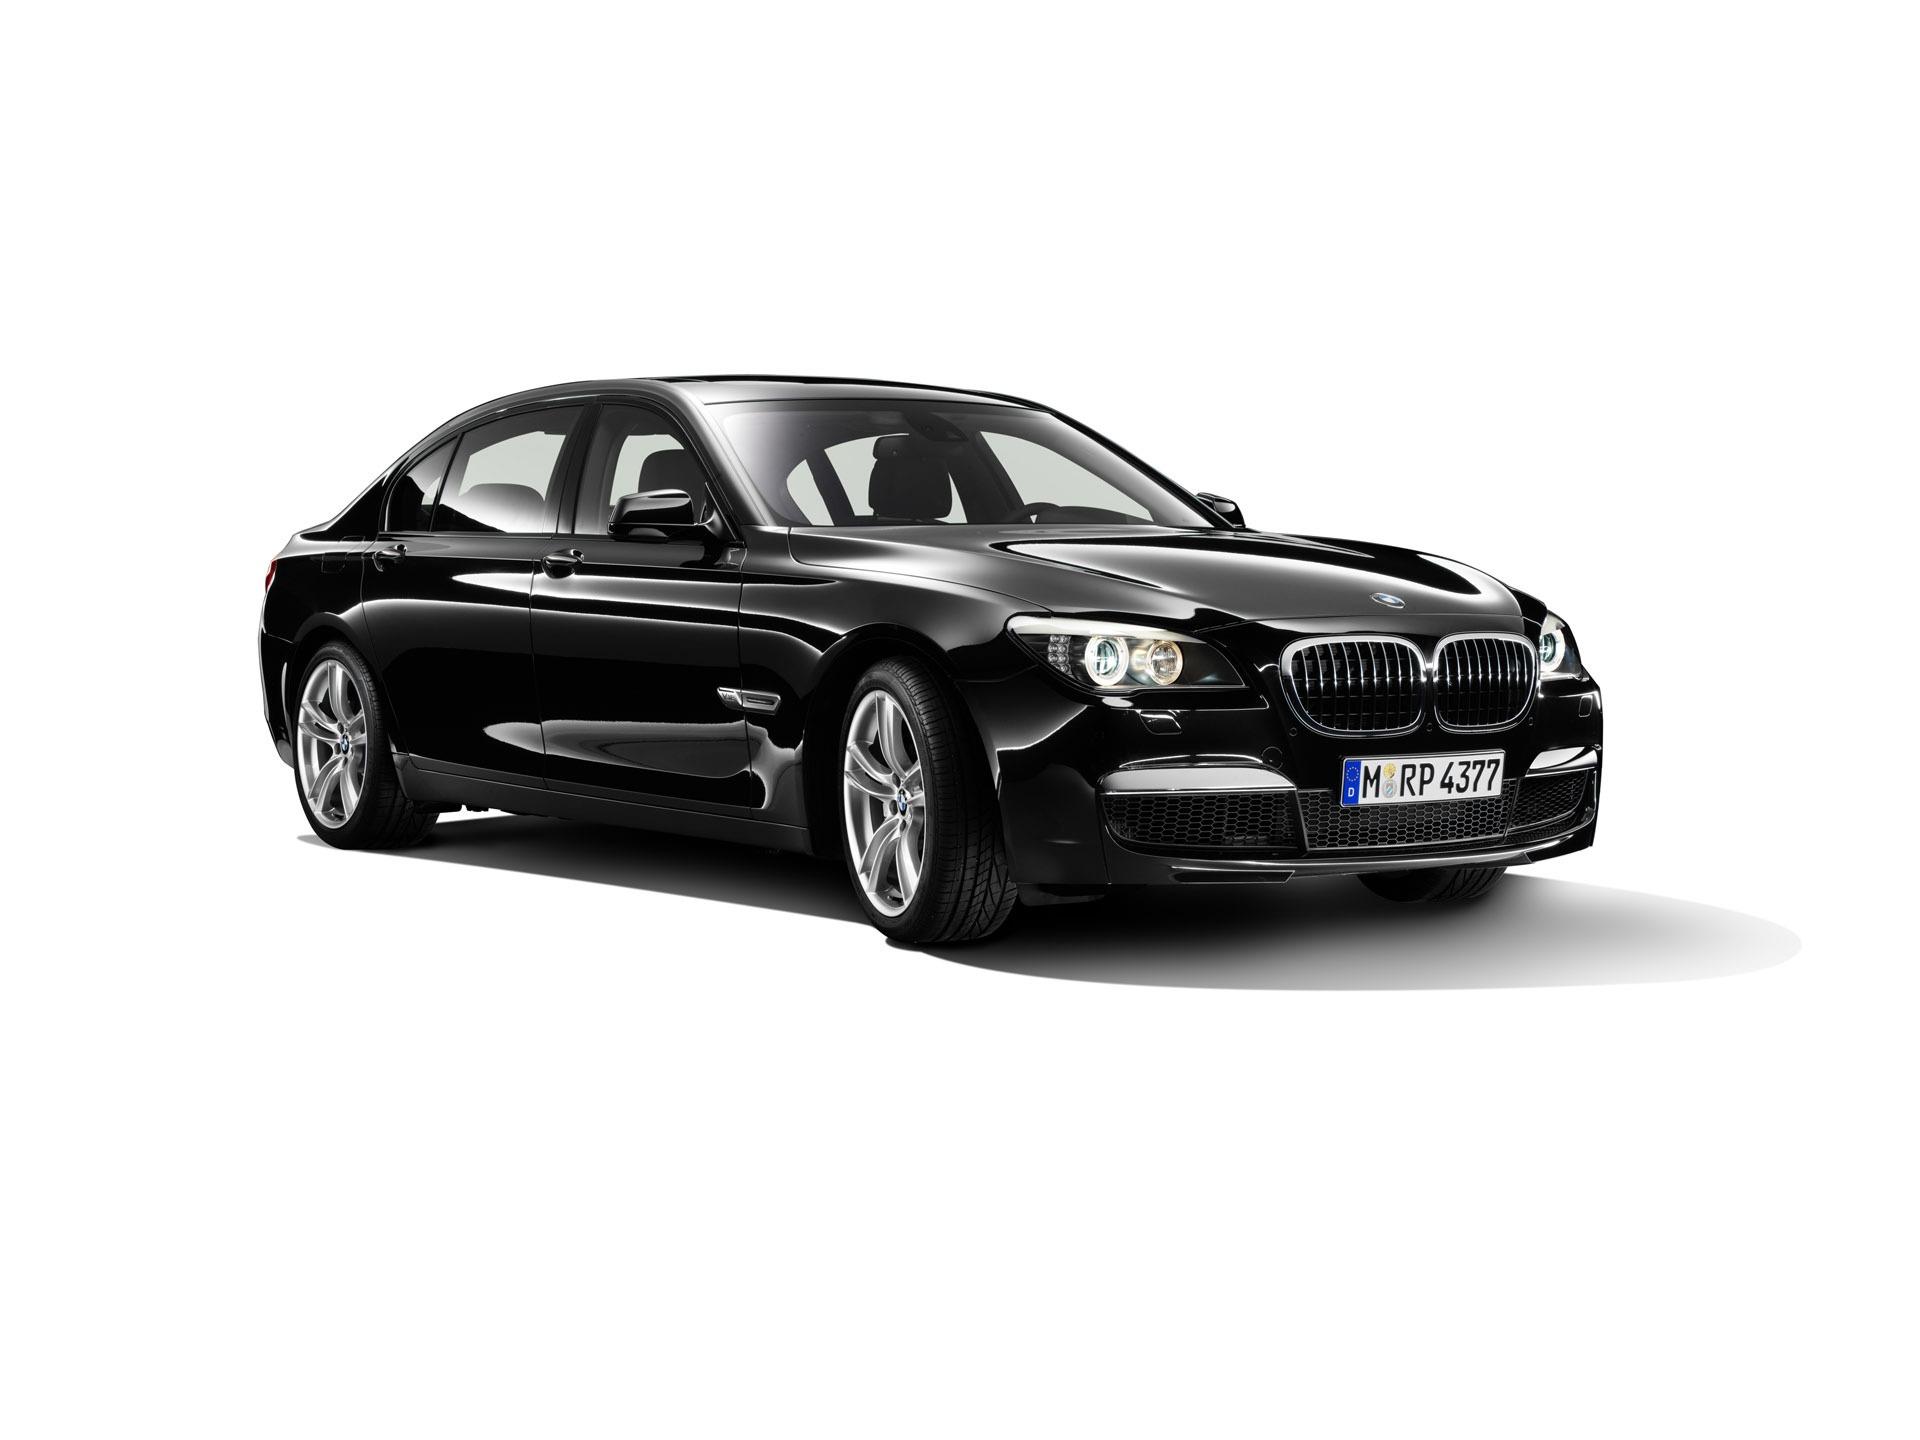 BMW Li Wallpaper Mercedes Cars Wallpapers In Jpg Format For - Black bmw car